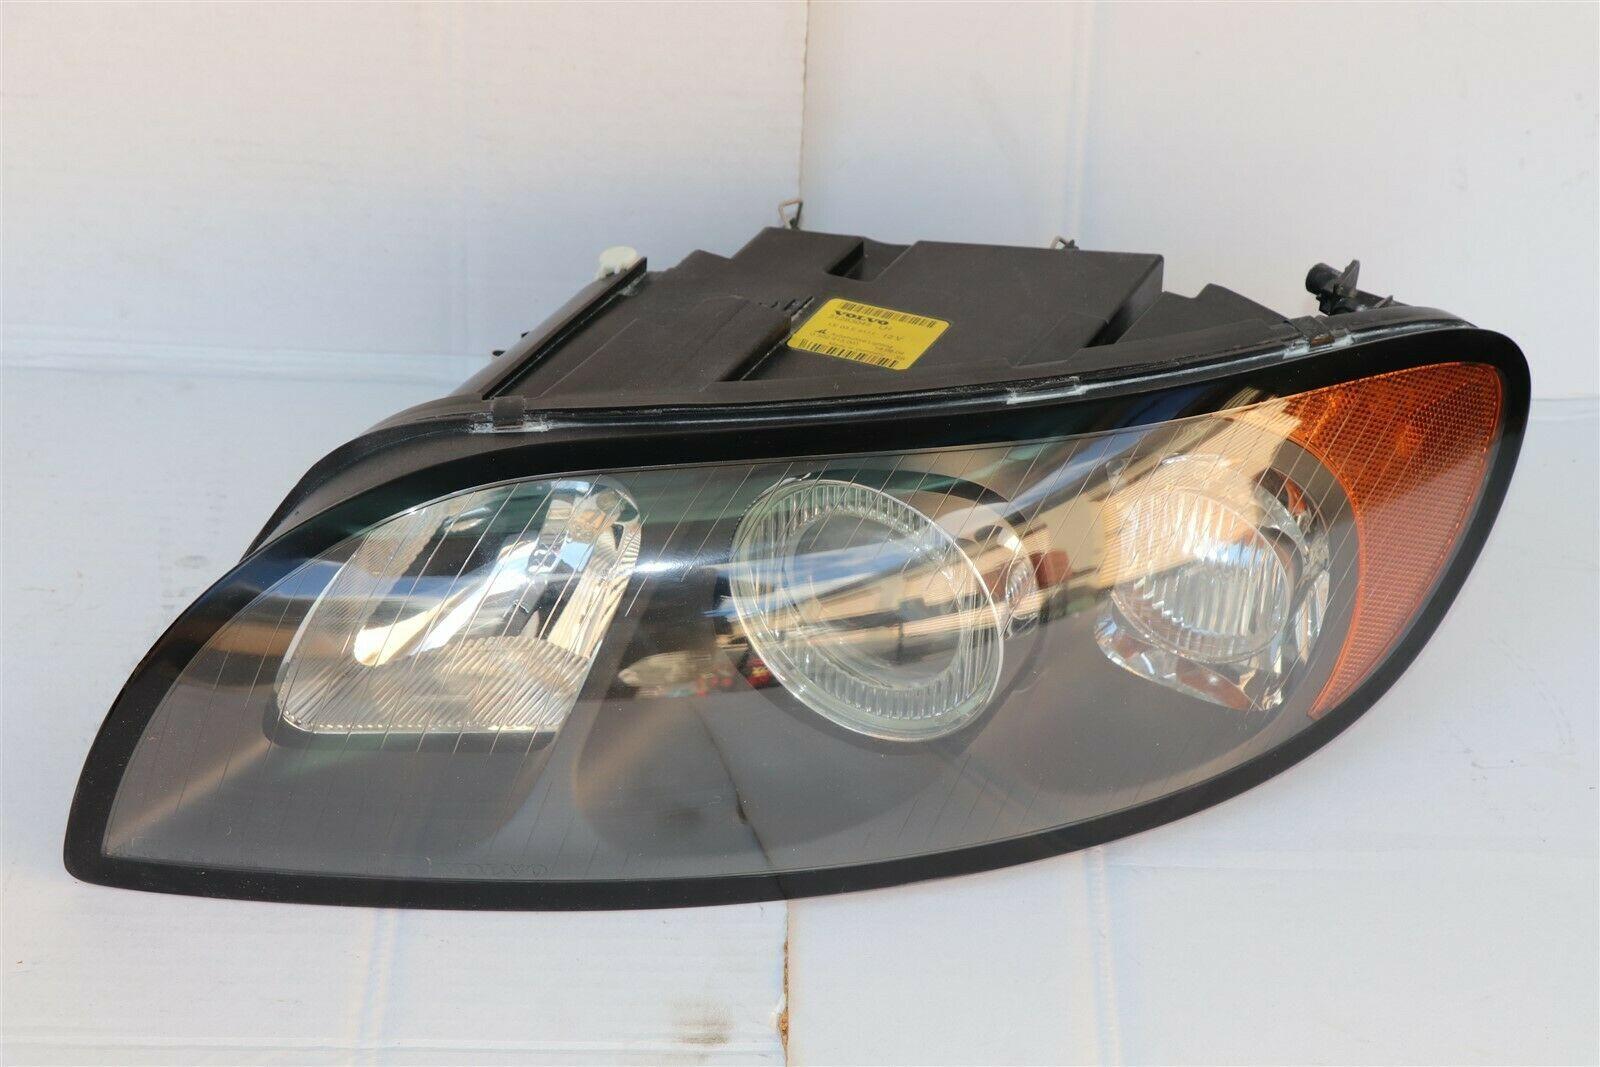 06-10 Volvo C70 Convertible Halogen Headlight Lamp Driver Left LH